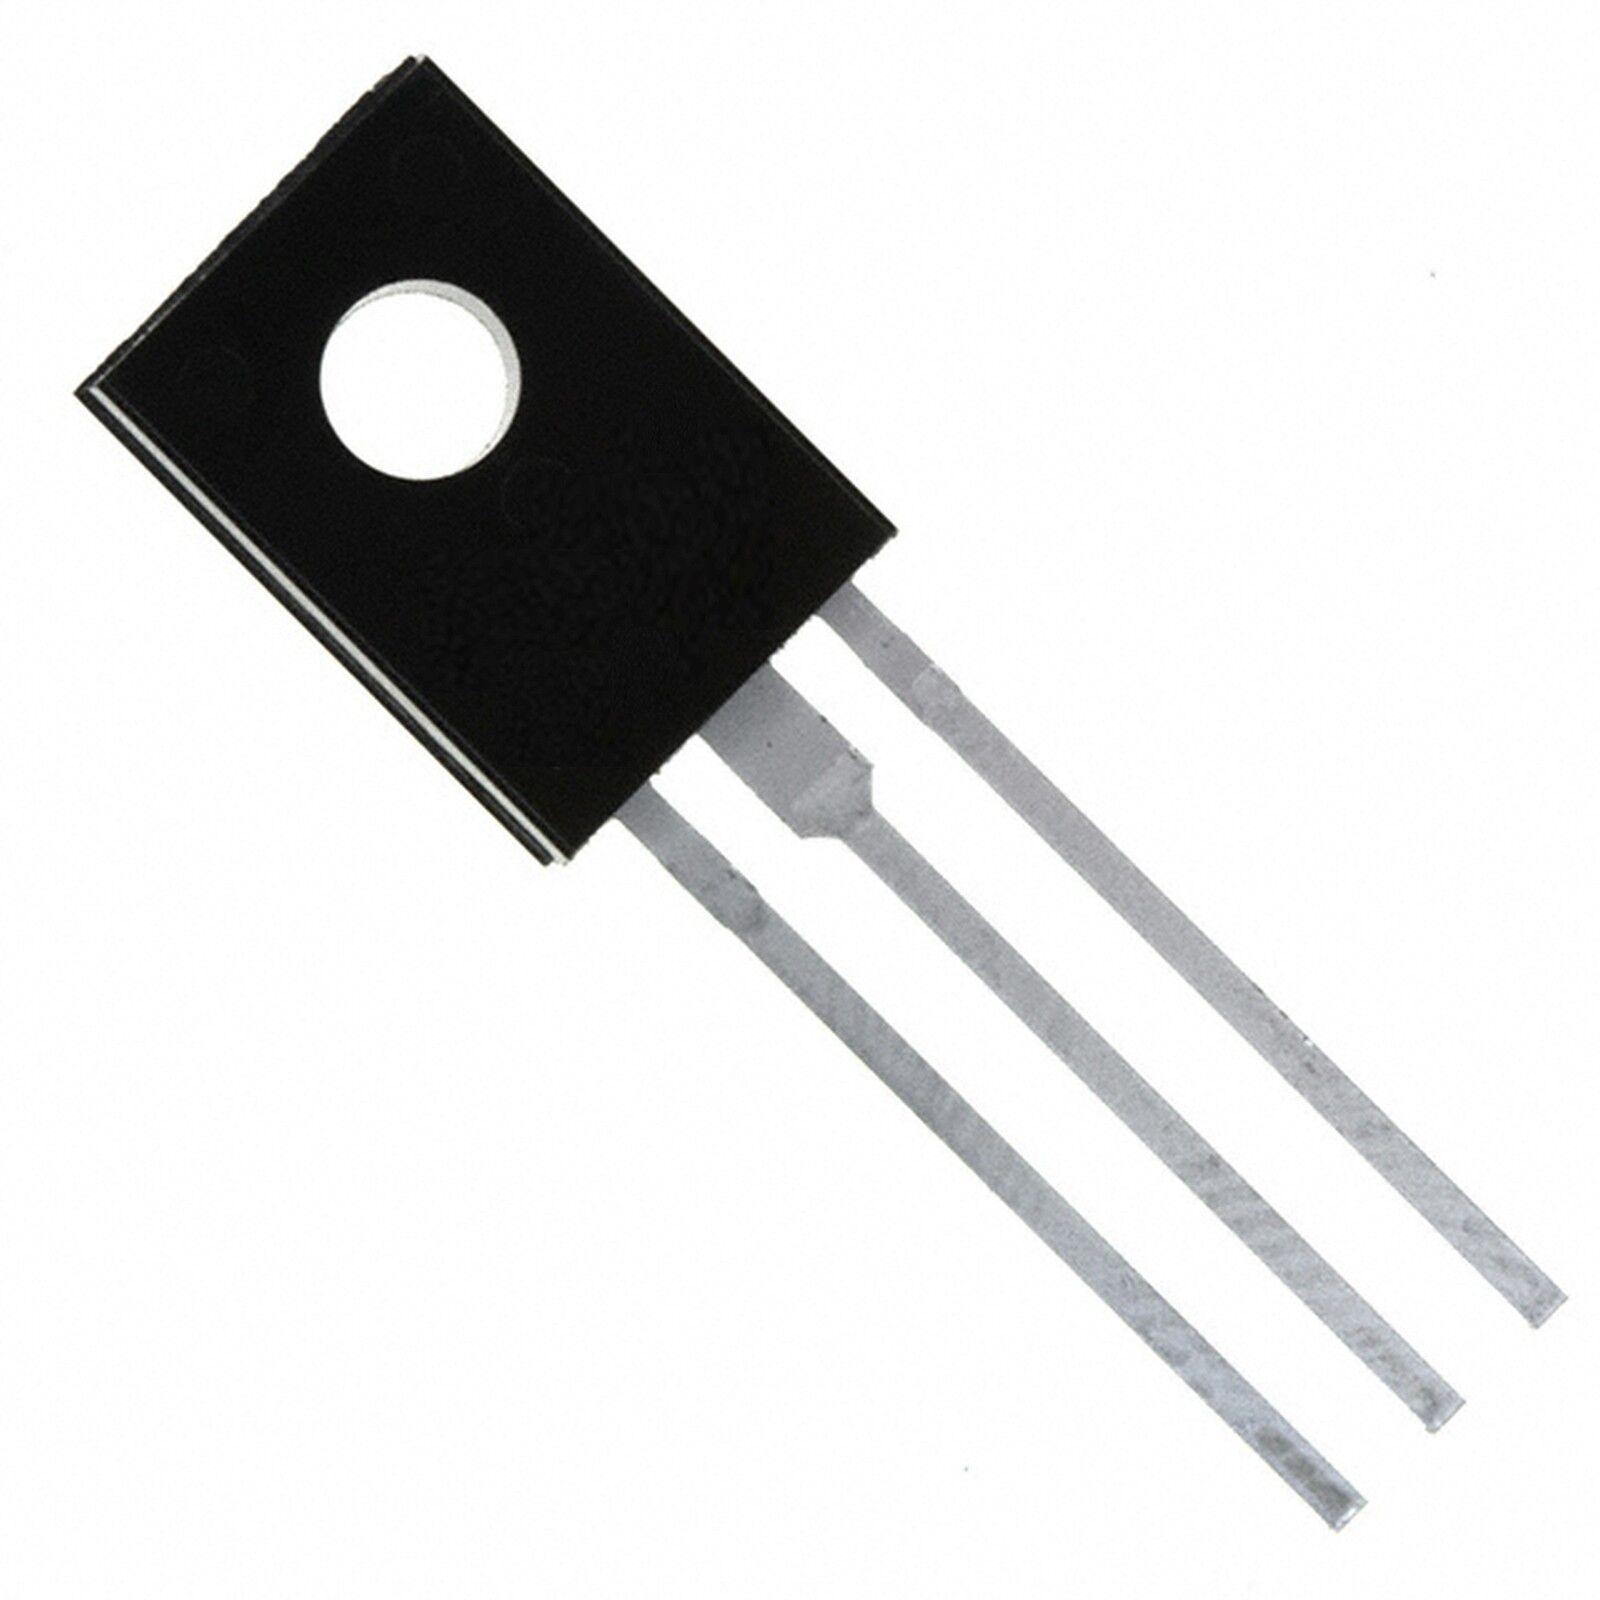 20 PCs mmbt 2222a onsemi transistor NPN 40v 0,6a sot23 New